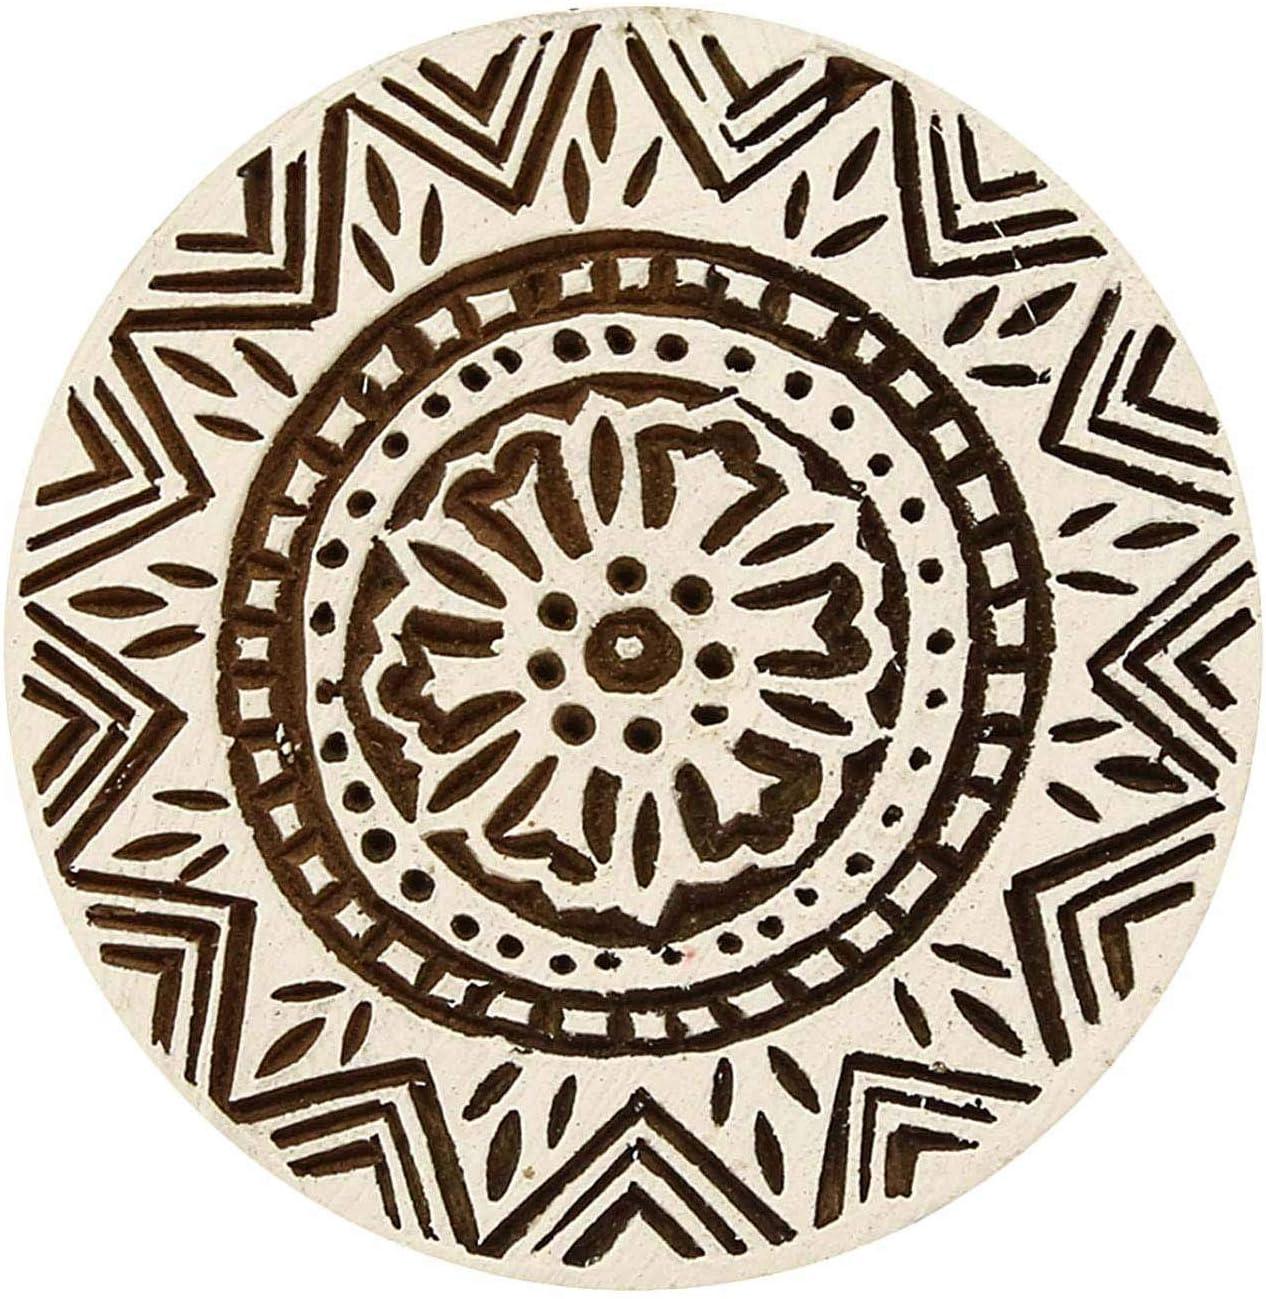 Sharvgun Indian Decorative Textile Portland Mall Pattern Stamps Carved Floral Super Special SALE held